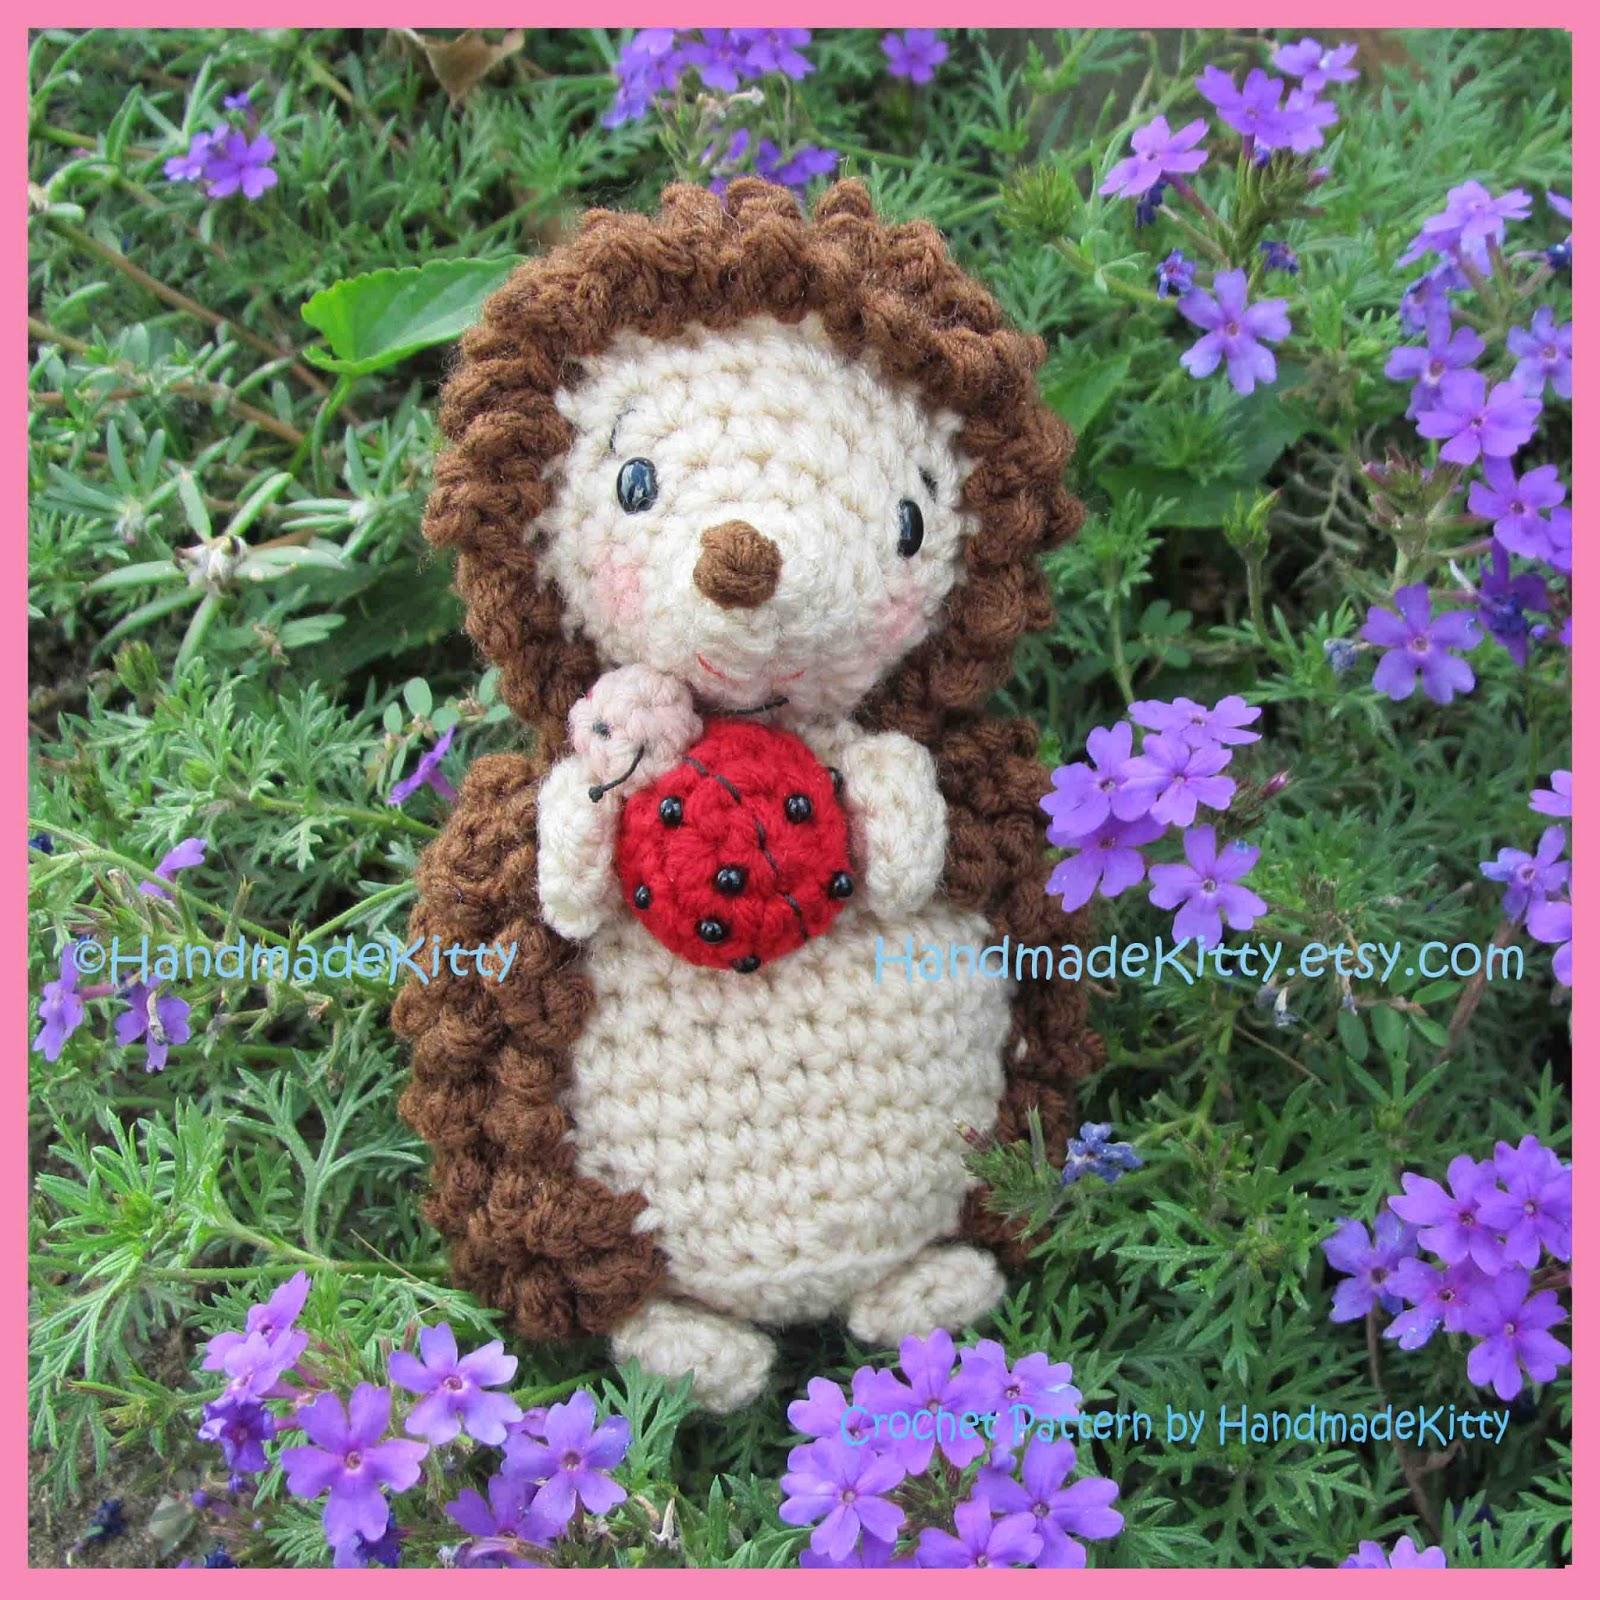 Handmadekitty hedgehog with little friend ladybug amigurumi hedgehog with little friend ladybug amigurumi crochet pattern by handmadekitty bankloansurffo Choice Image